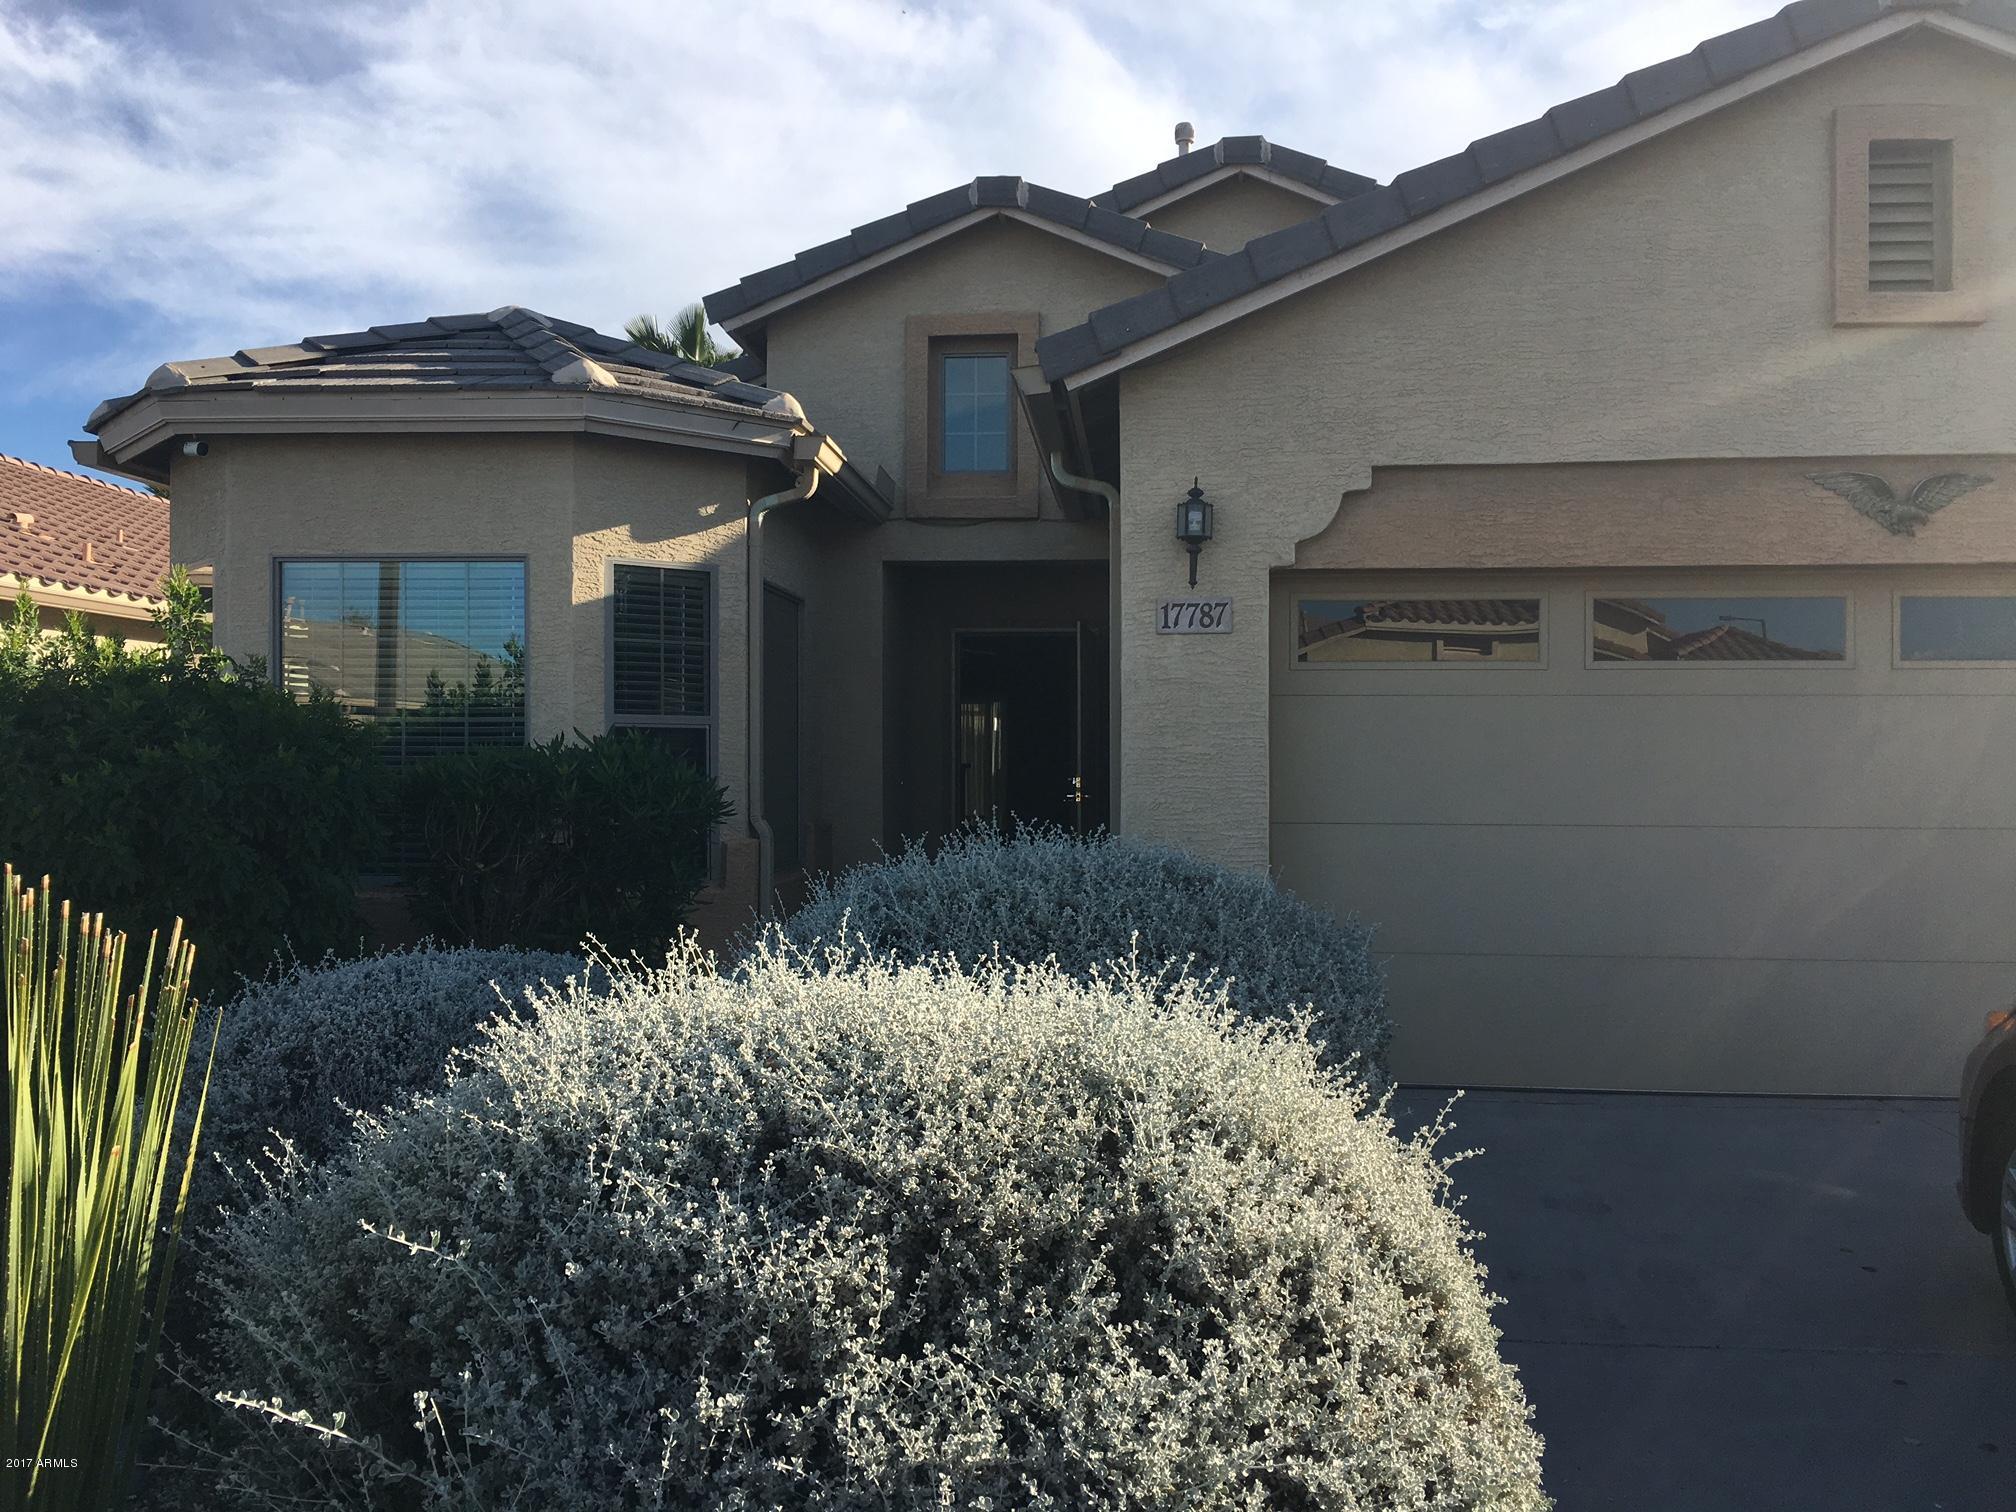 17787 W RIMROCK Street, Surprise, AZ 85388, 3 Bedrooms Bedrooms, ,Residential Lease,For Rent,17787 W RIMROCK Street,5563009